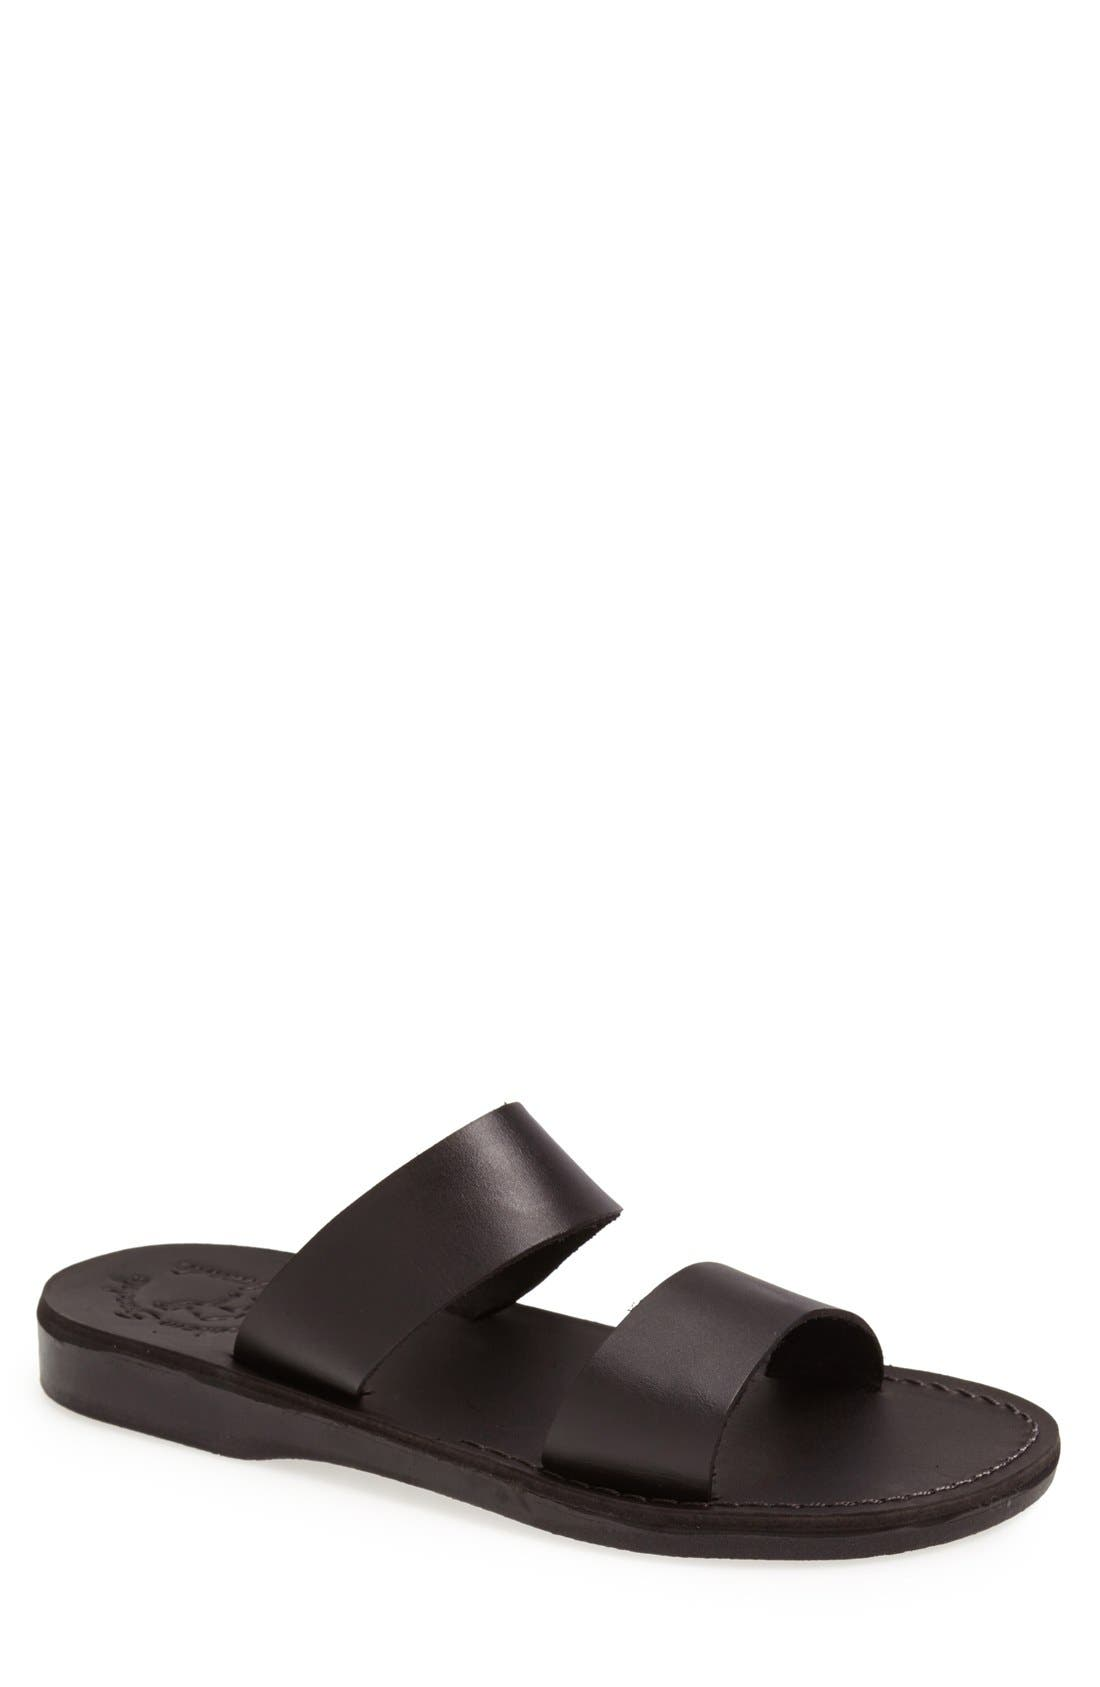 'Aviv' Leather Sandal, Main, color, BLACK